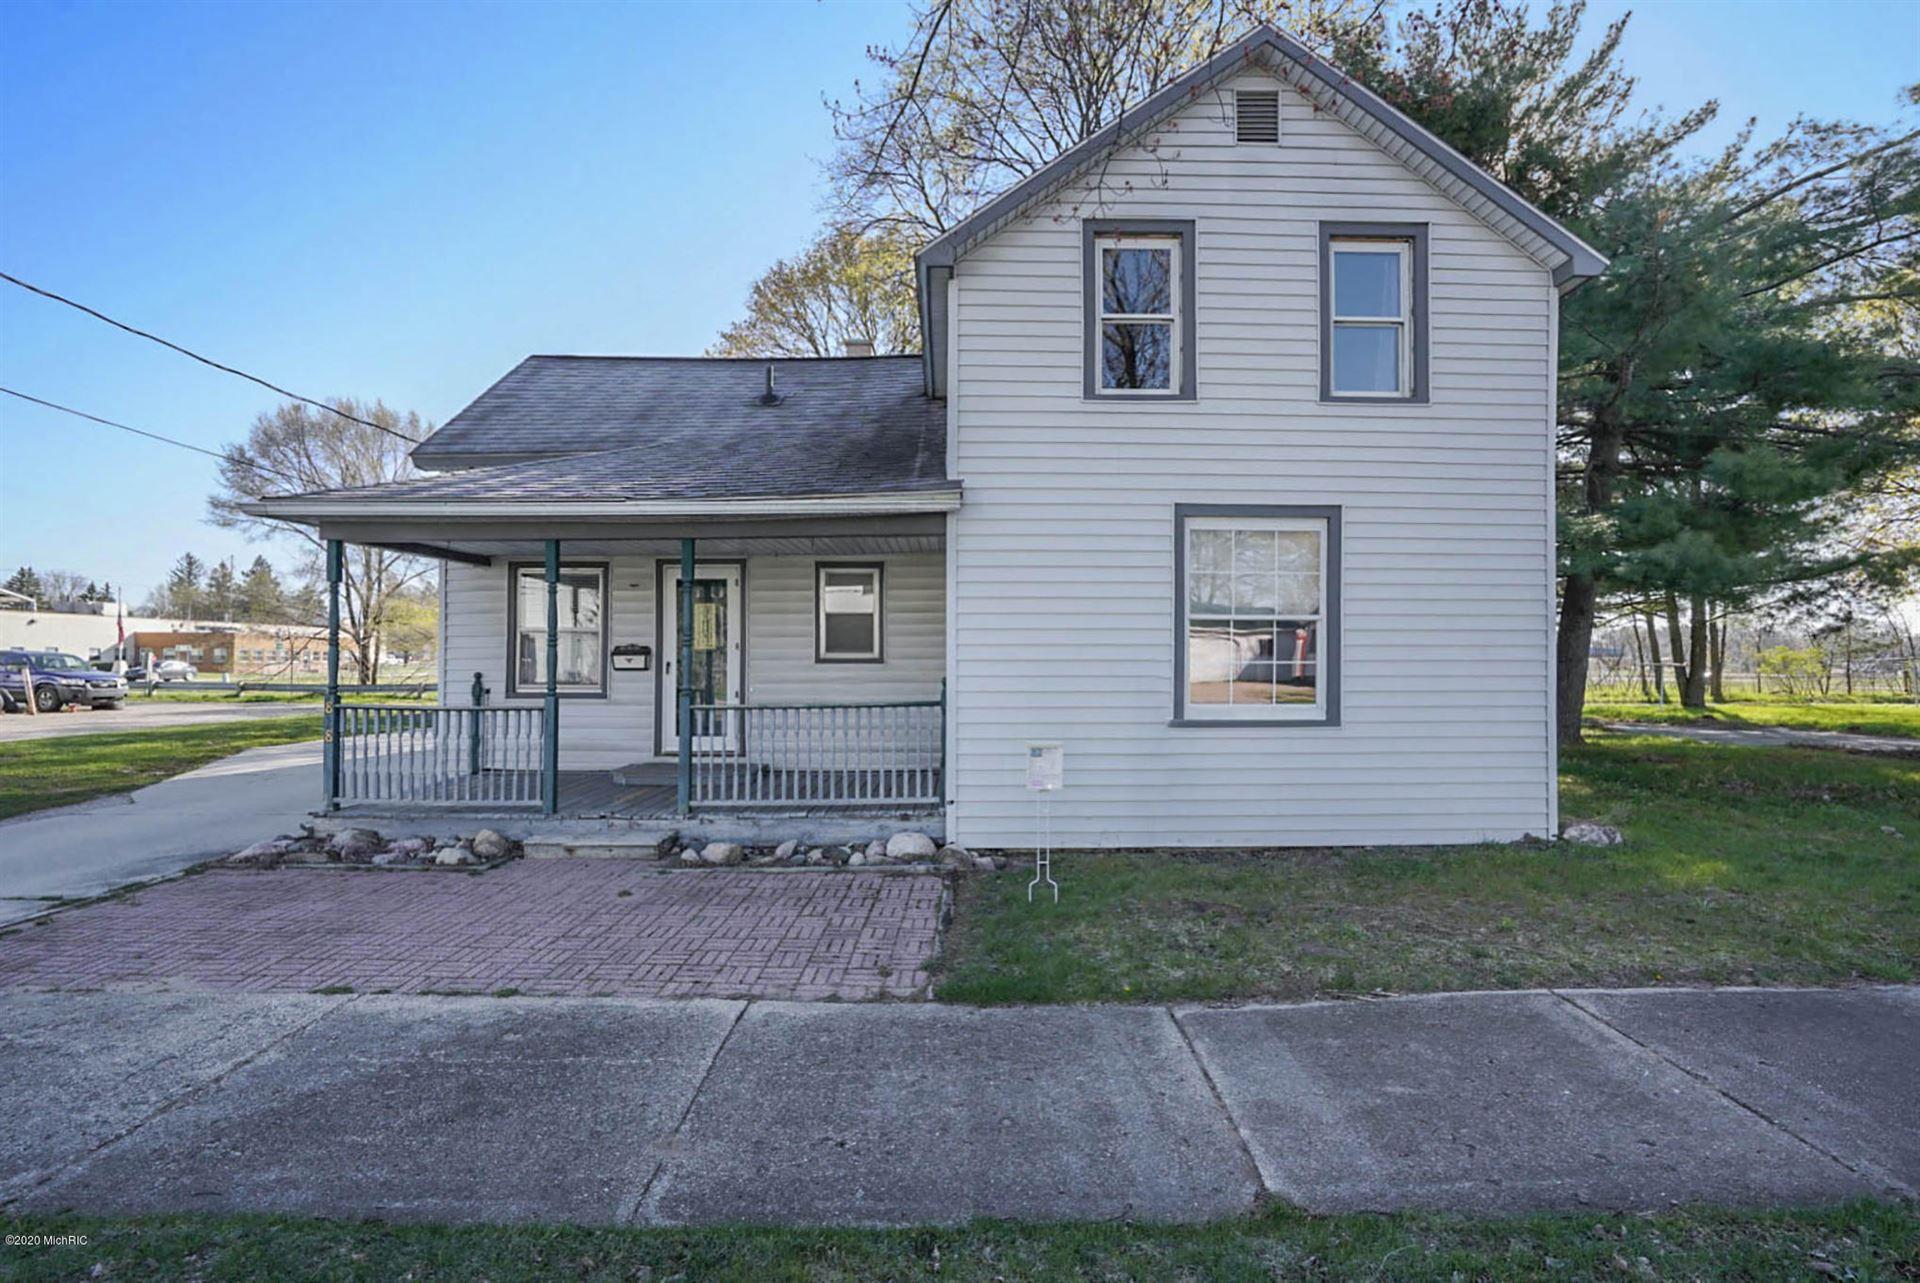 828 N 4th Avenue, Big Rapids, MI 49307 - #: 20013988